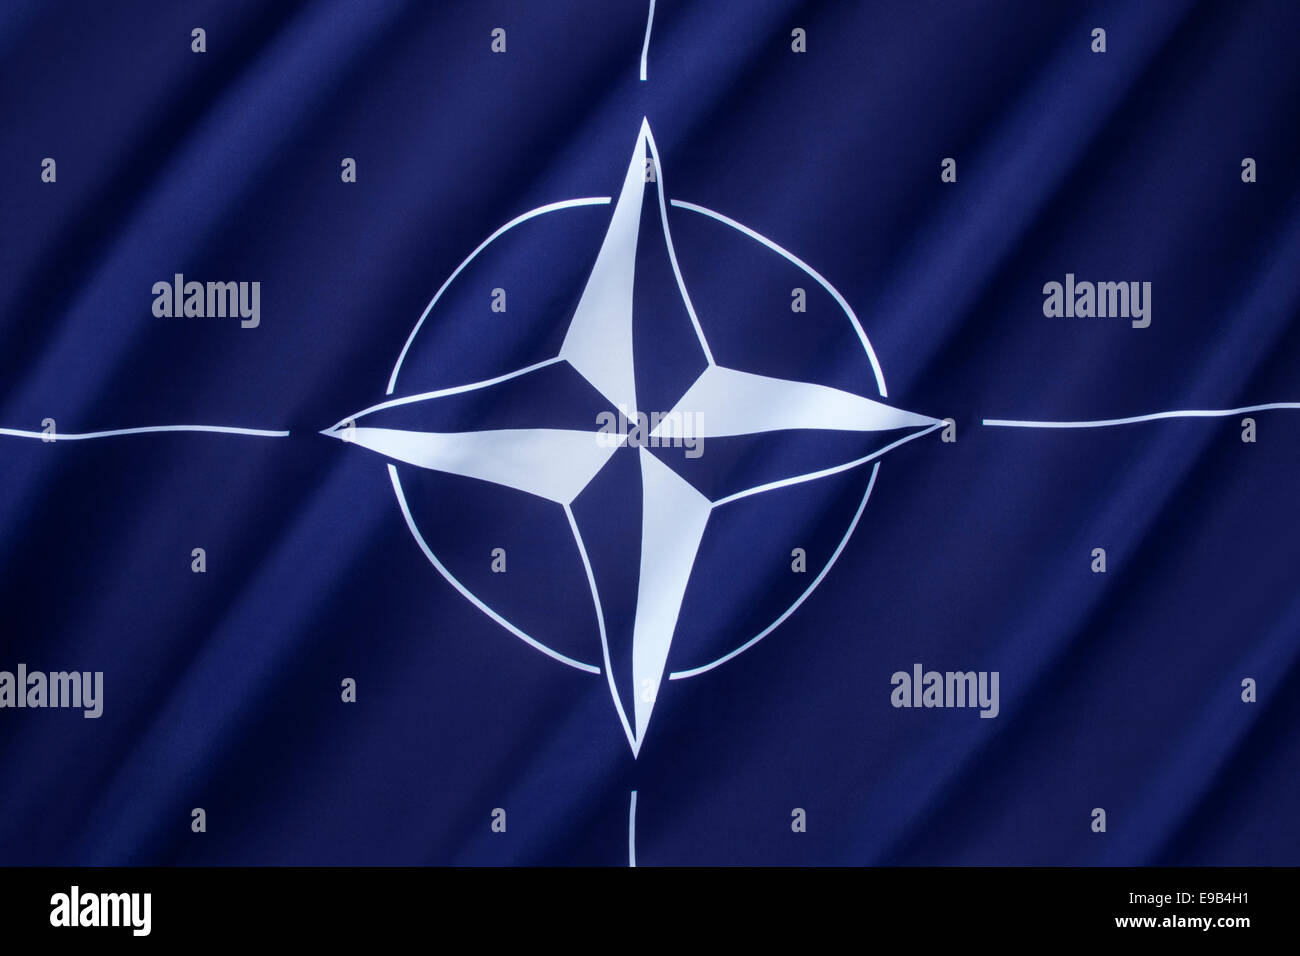 The flag of the North Atlantic Treaty Organization - NATO - Stock Image